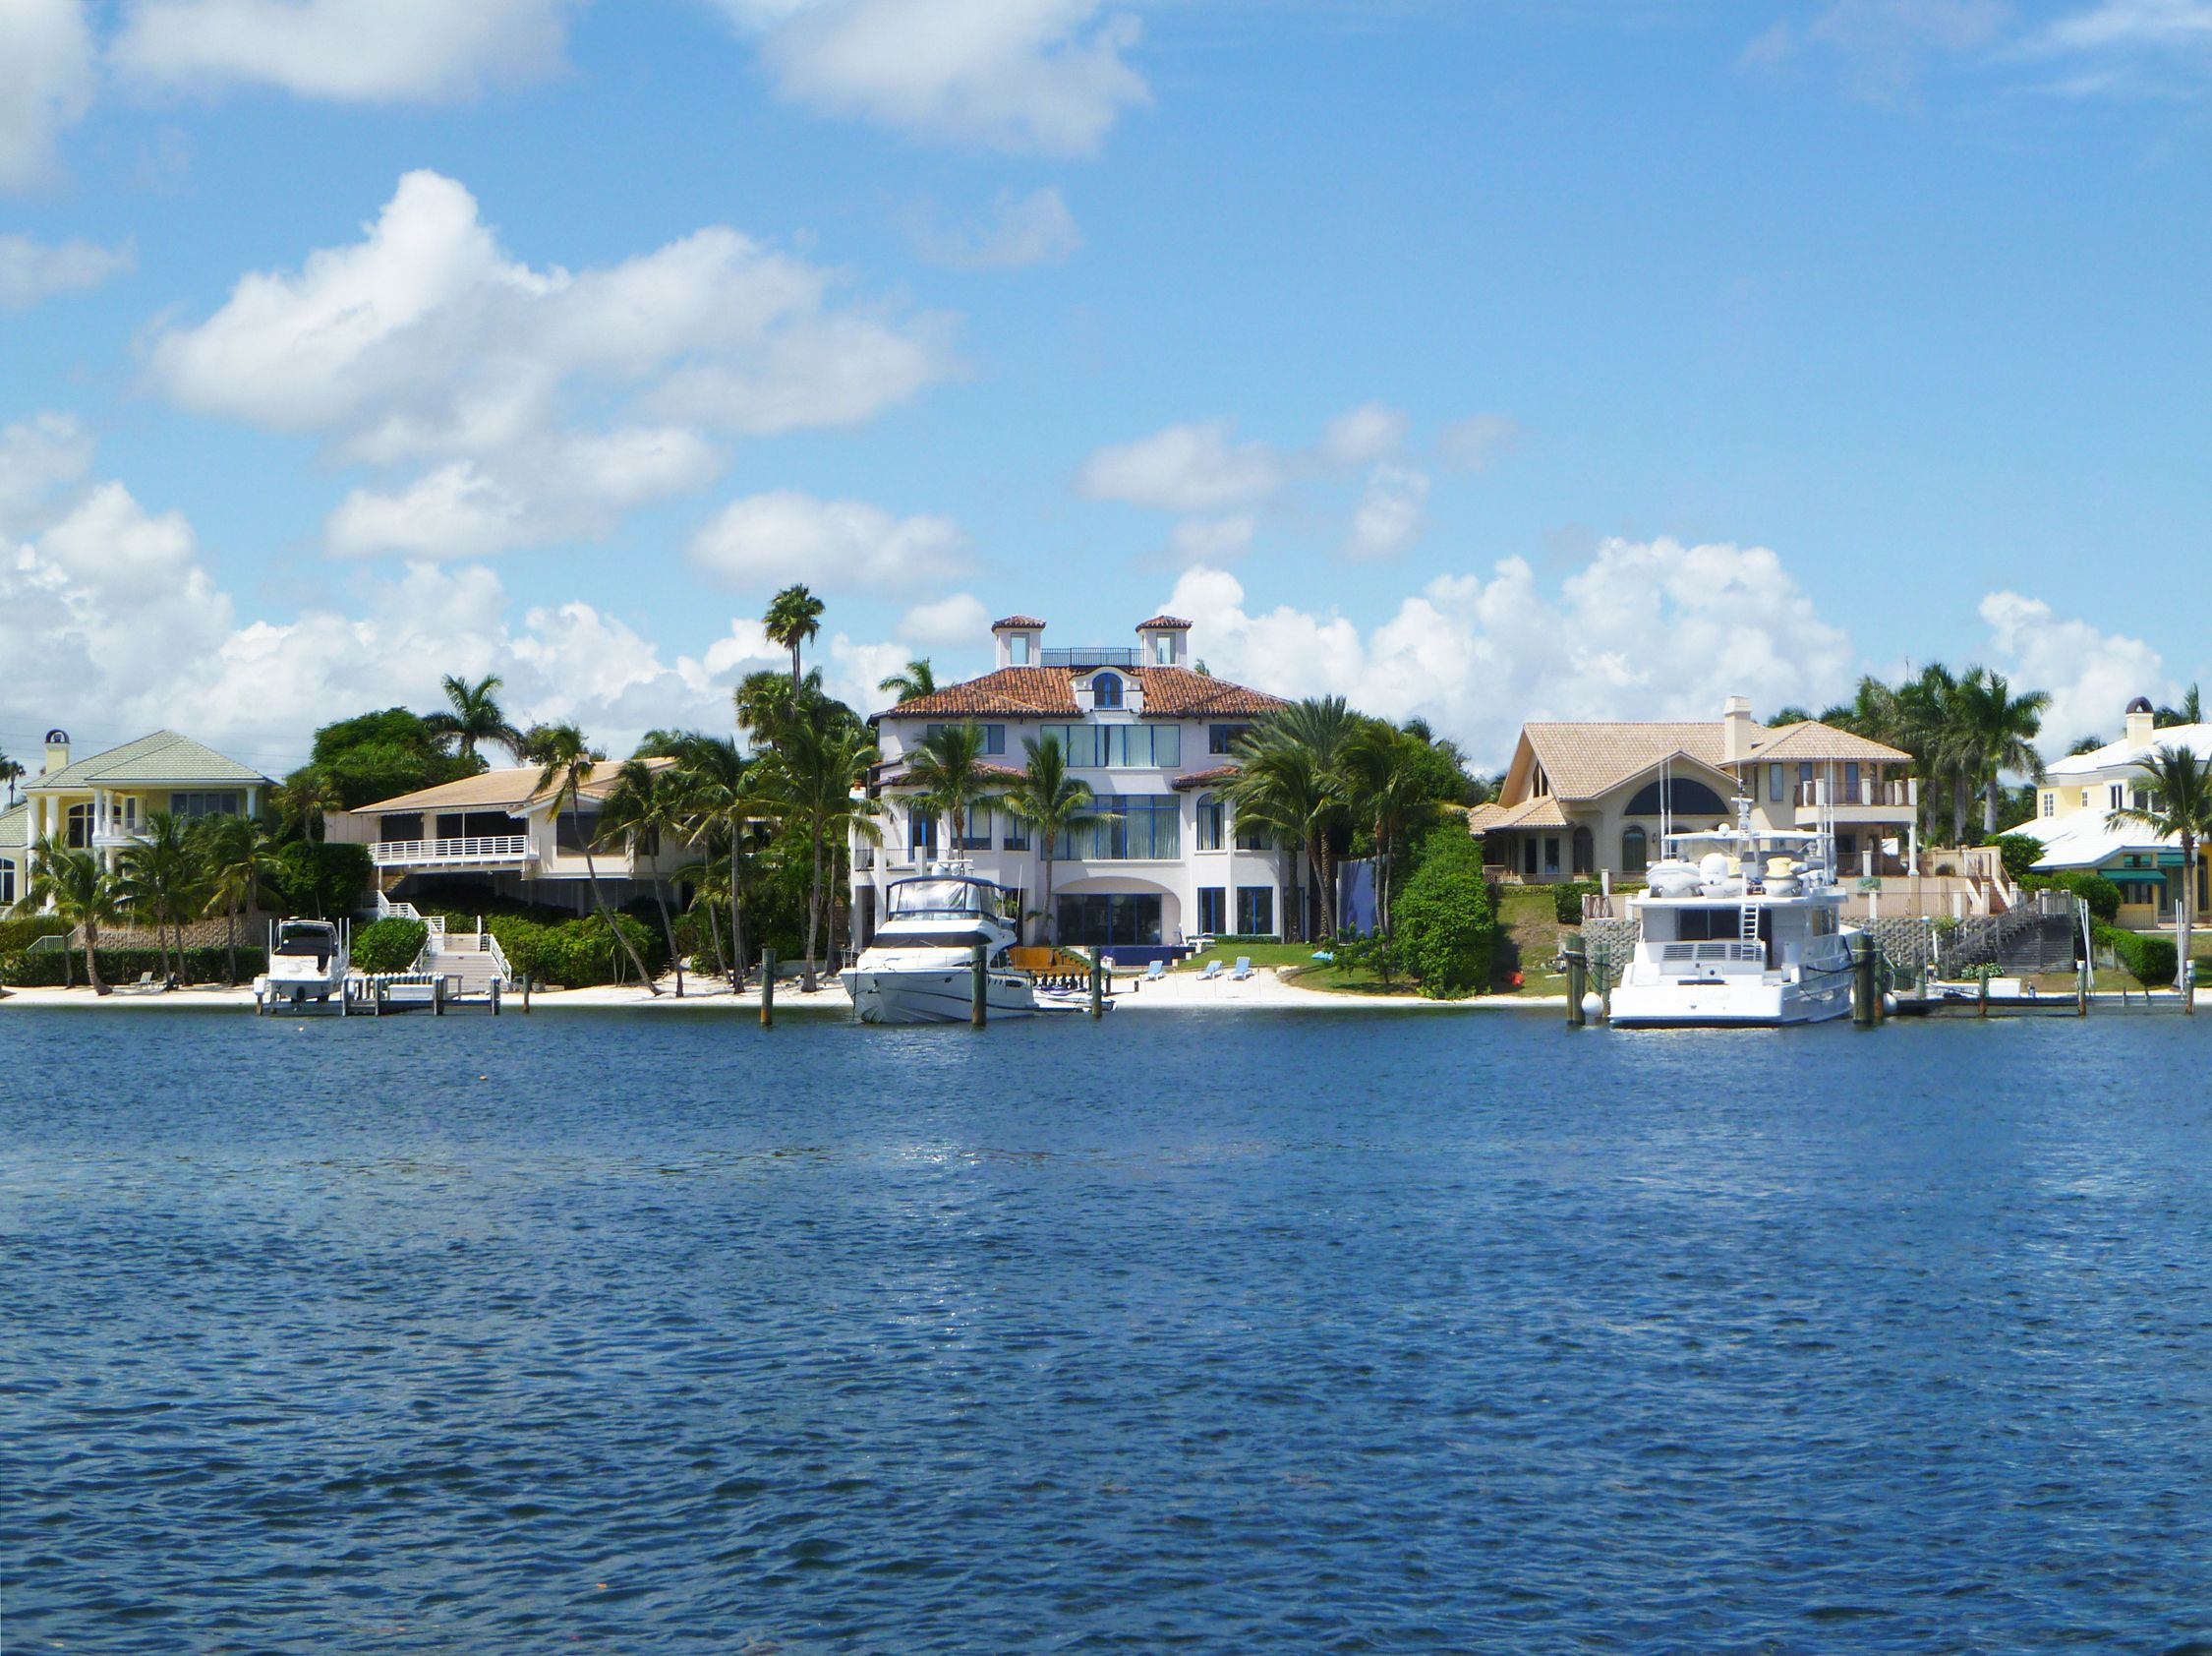 Waterfront Homes In Jupiter Florida Jupiter Florida Pinterest